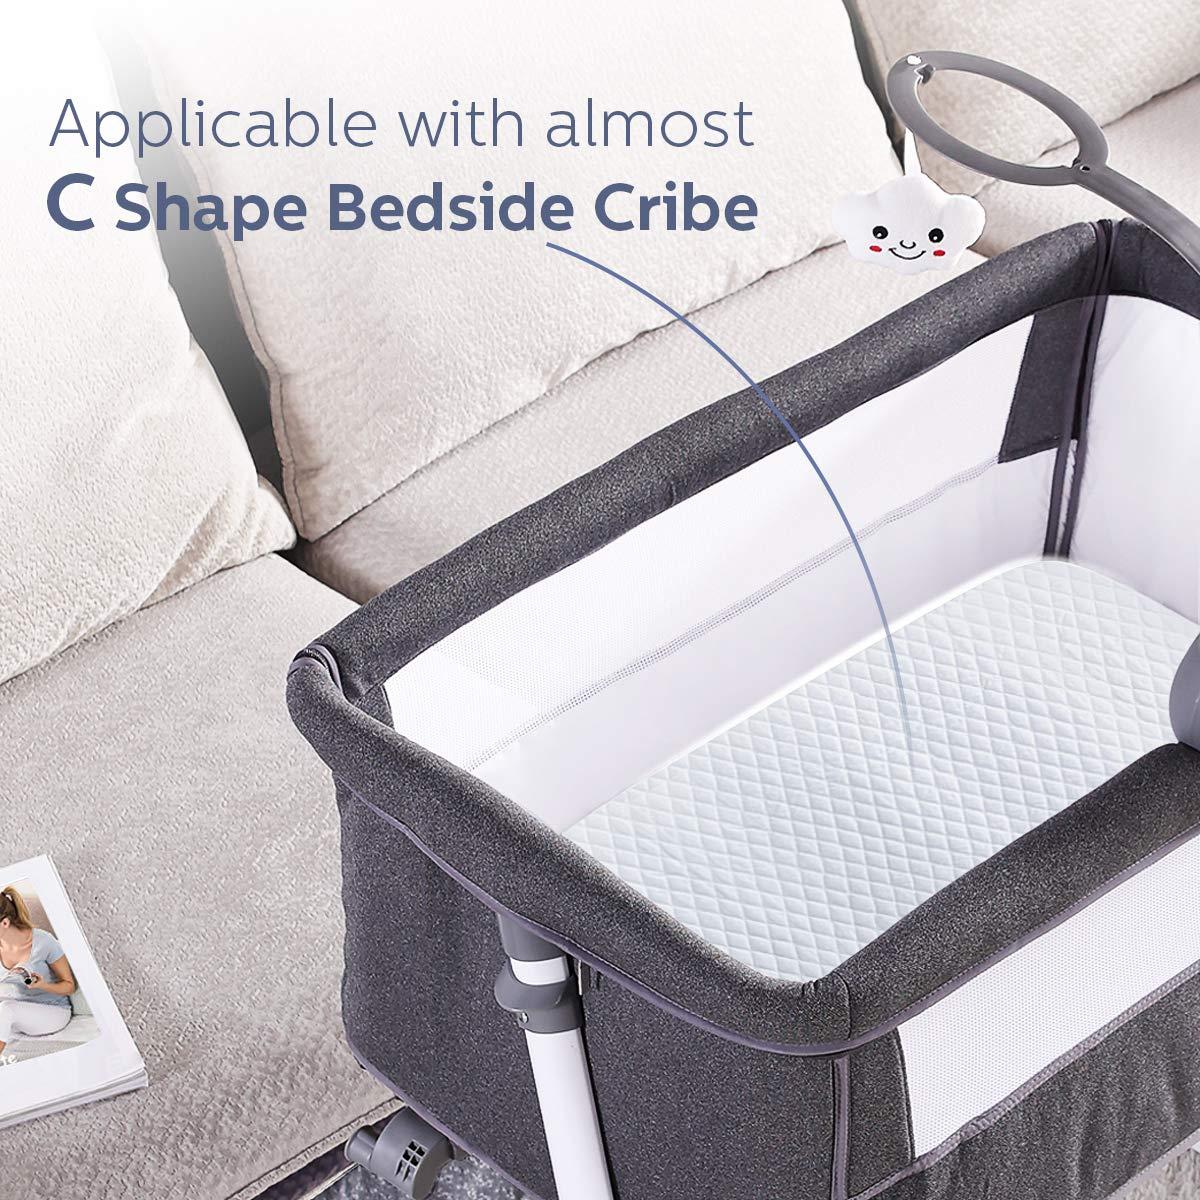 Babymatratze Kindermatratze Kinderbett und Babybett ADOVEL Matratzen f/ür Babybetten